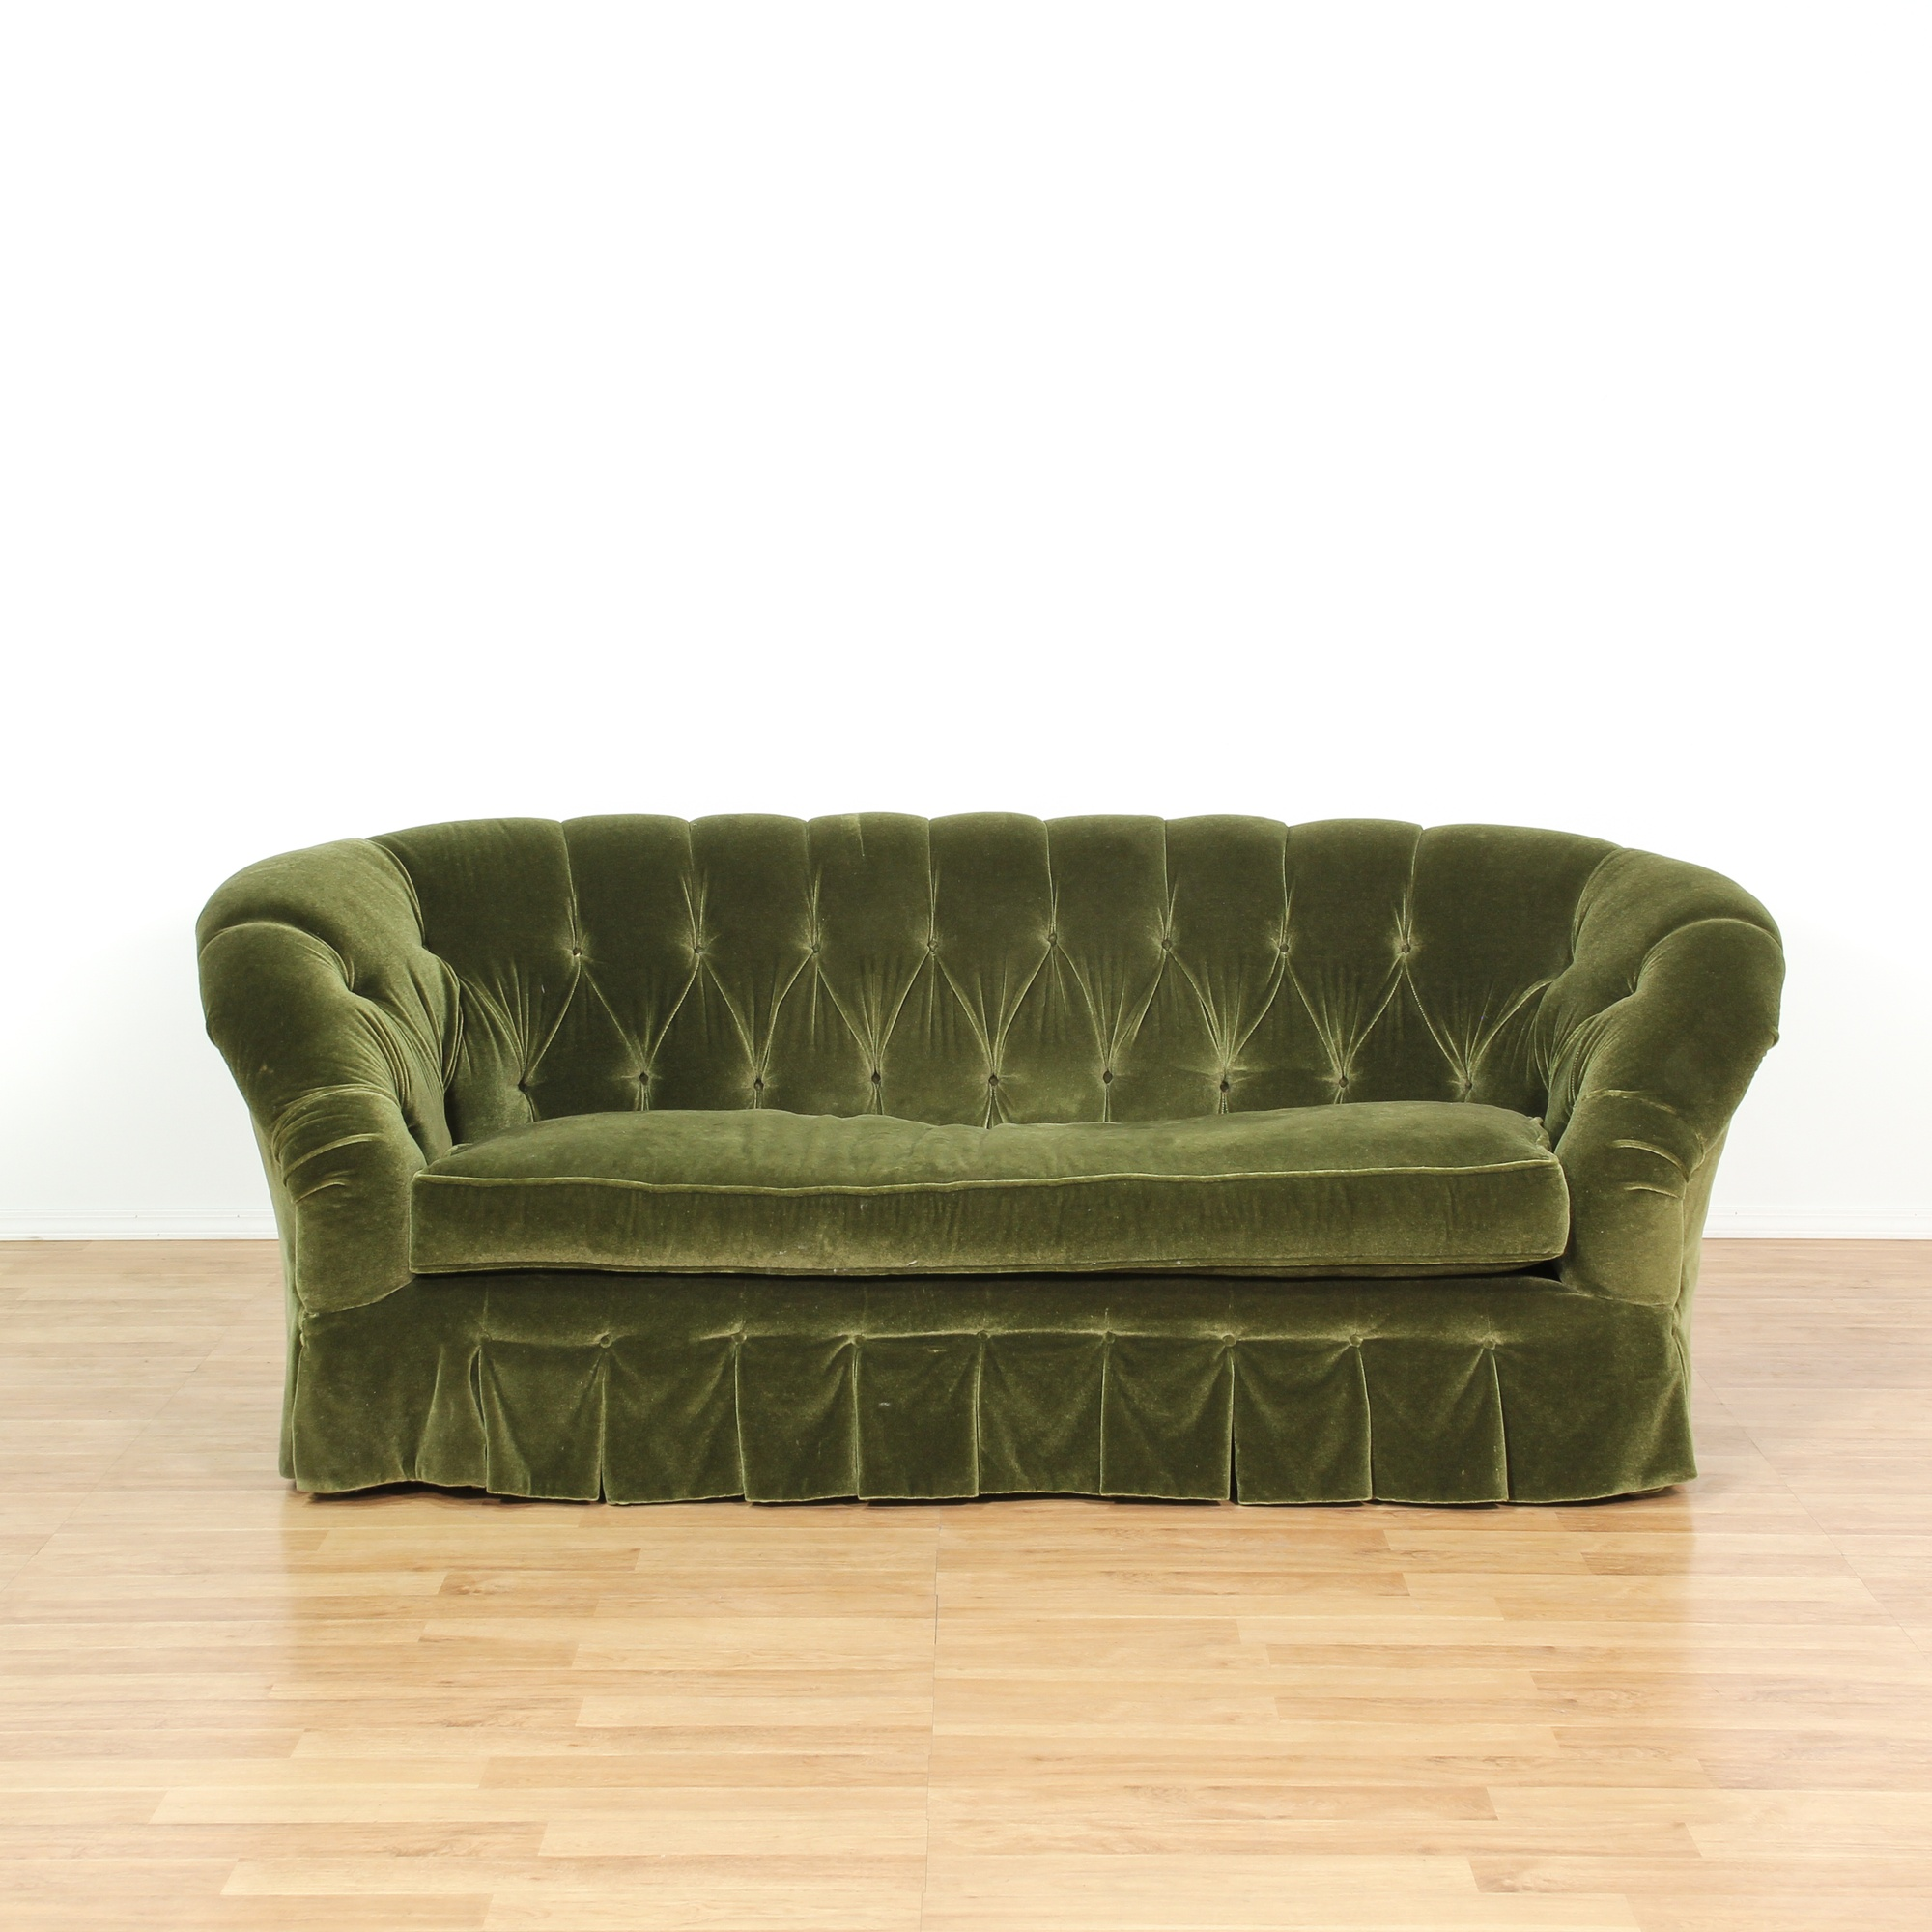 free shipping mystere today velvet modern overstock loveseat home green garden fabric skyline product furniture